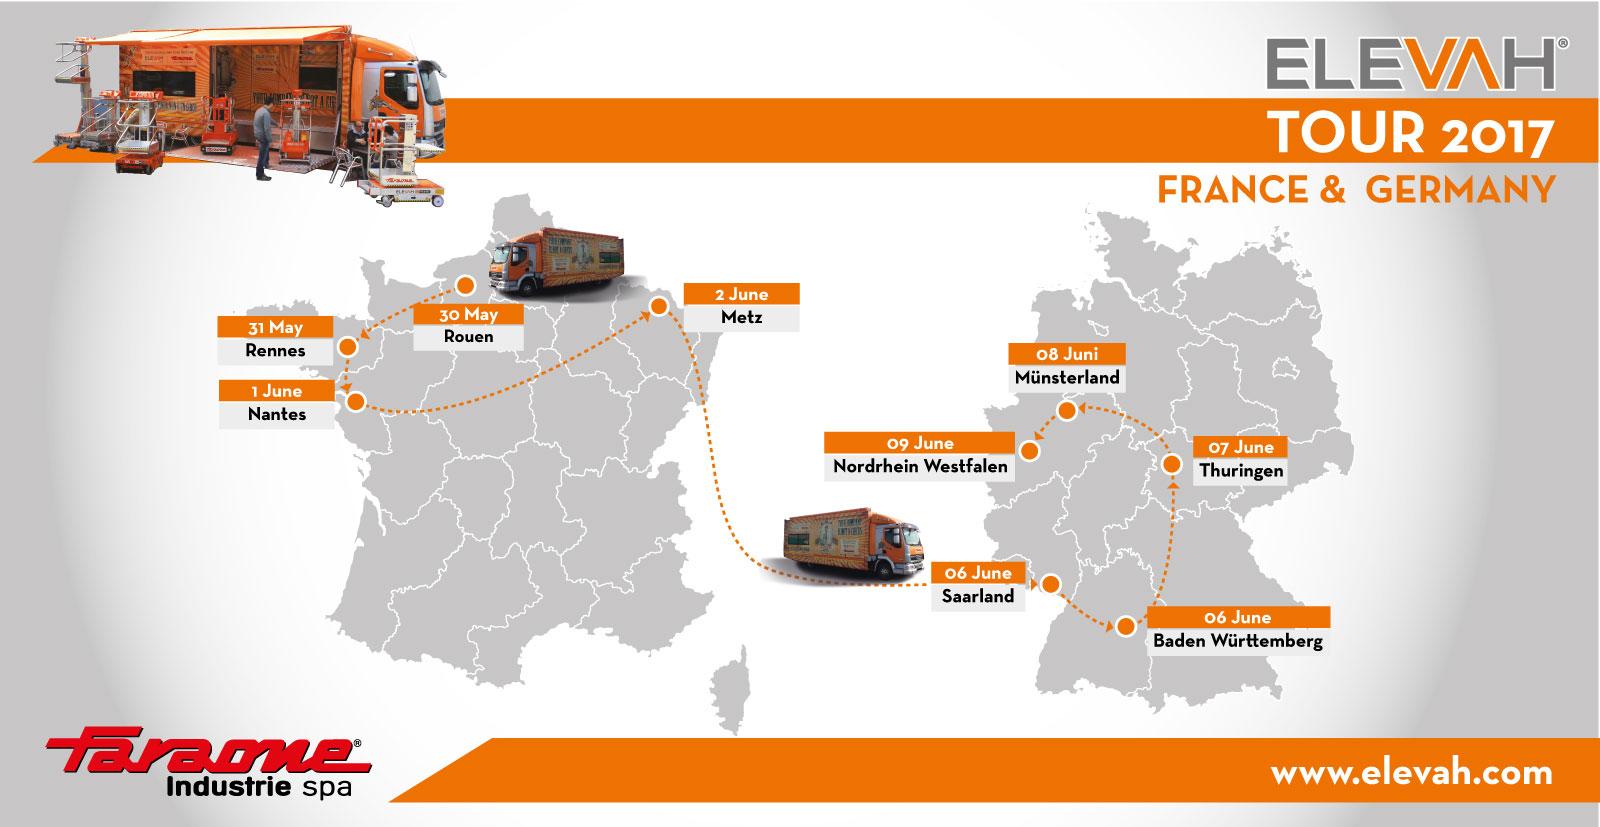 Elevah tour 2017 Francia e Germania